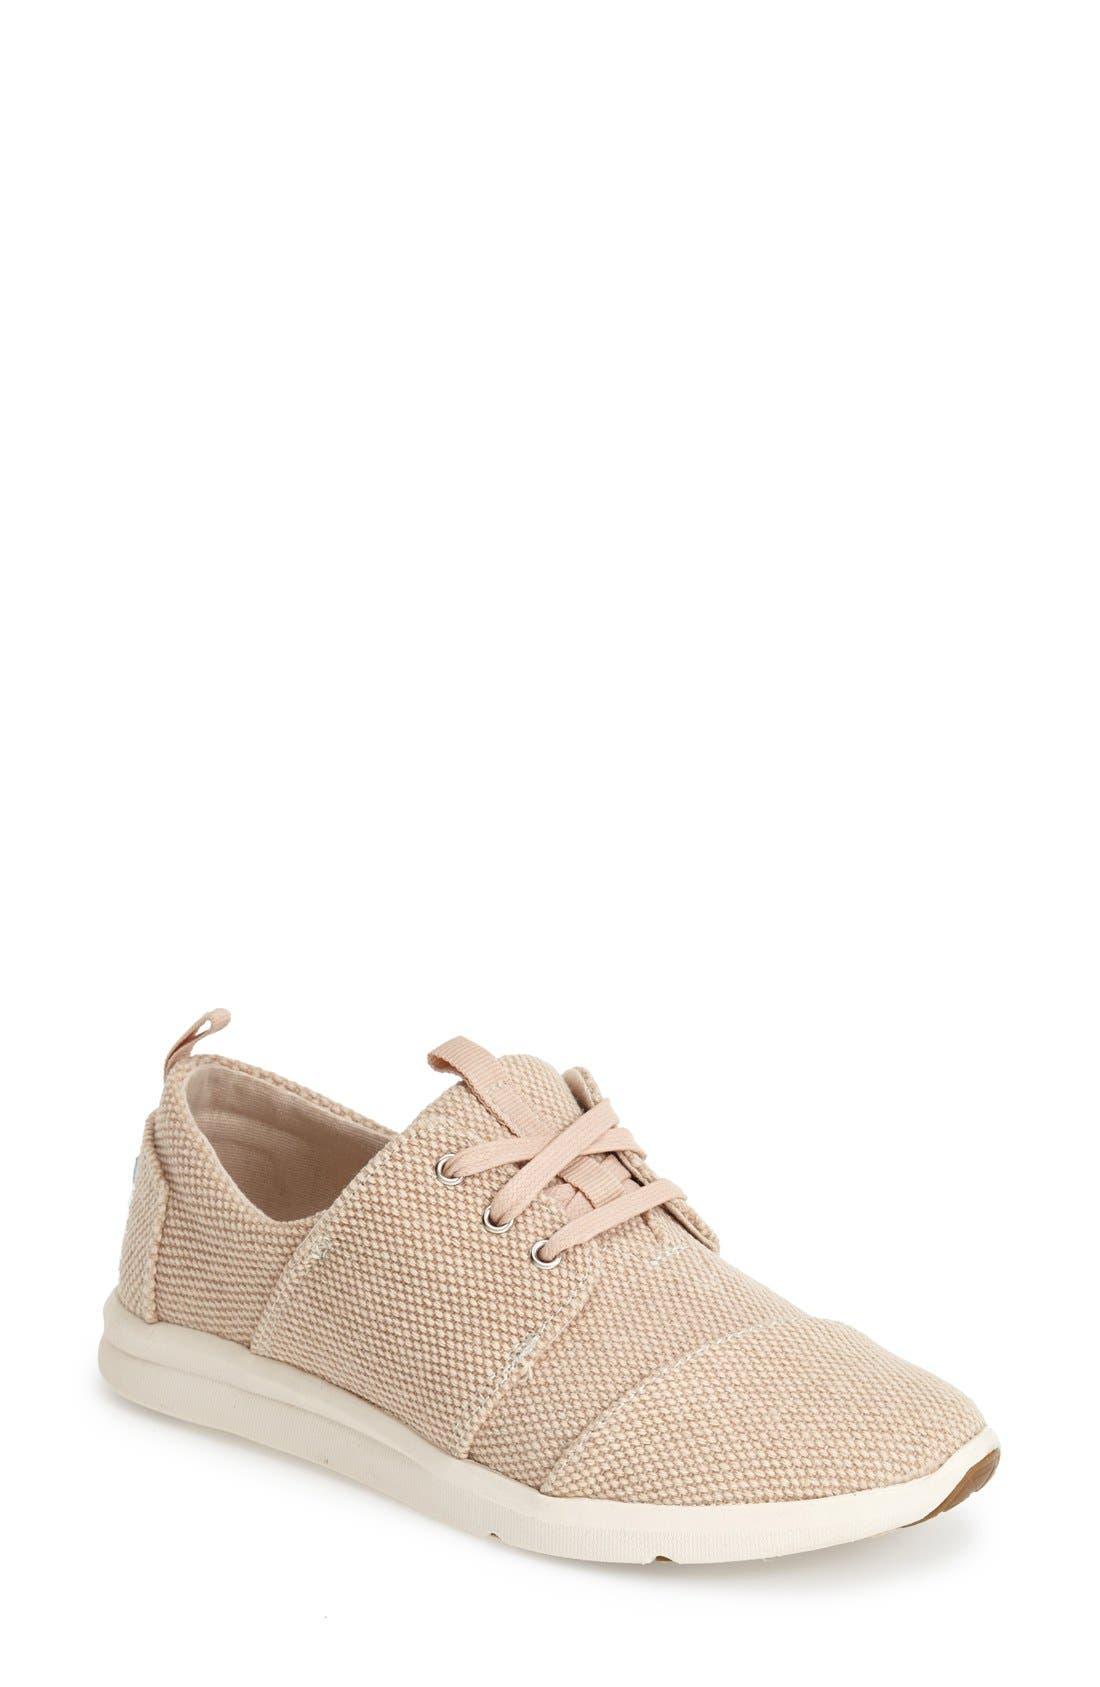 Main Image - TOMS 'Del Rey' Sneaker (Women)